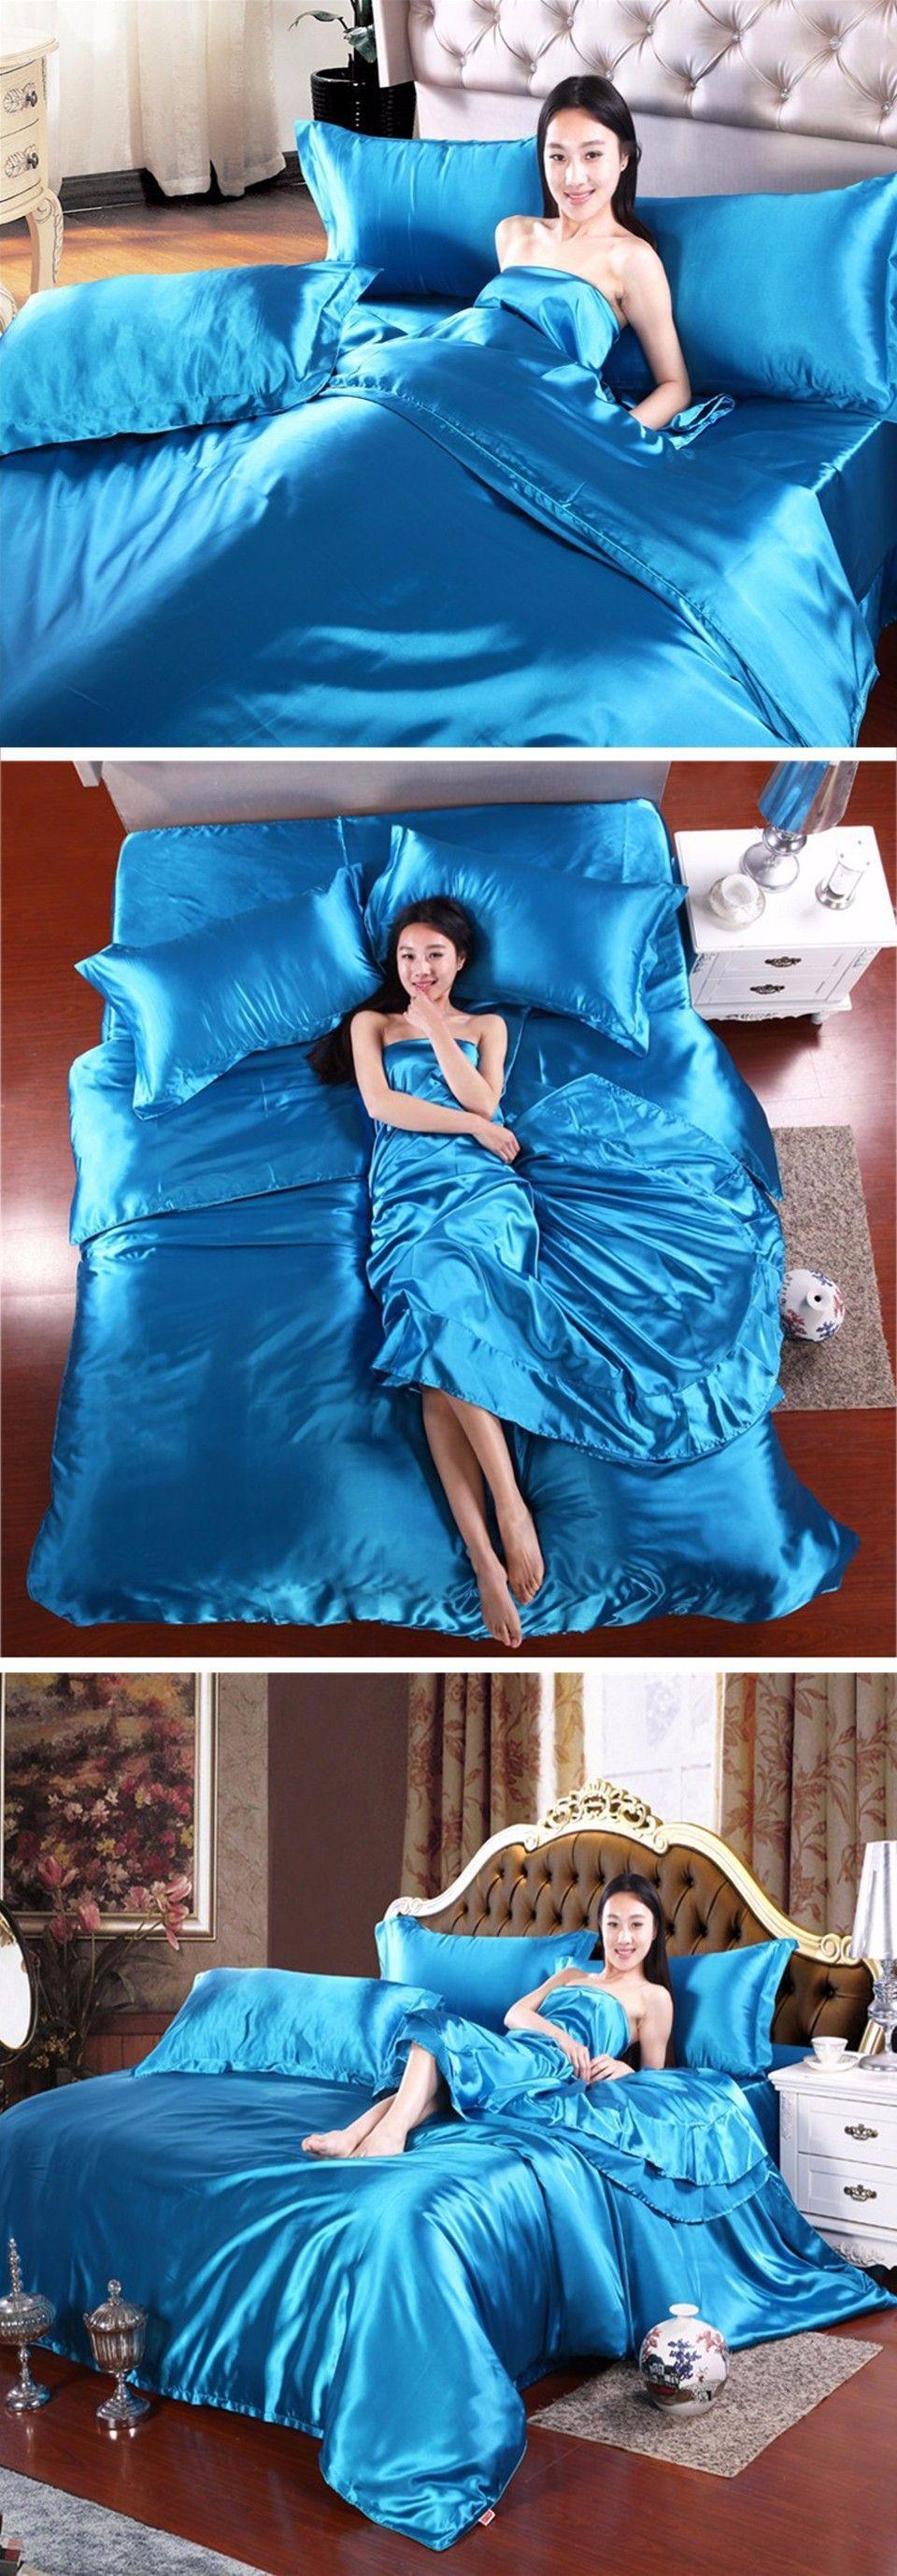 Aliexpress Com Buy Beddingoutlet Bedding Set Silky Sheet Chinese Silk Bedspreads King Size Purple Blue Bed Li Purple Bedding Satin Bedding Blue Linen Bedding